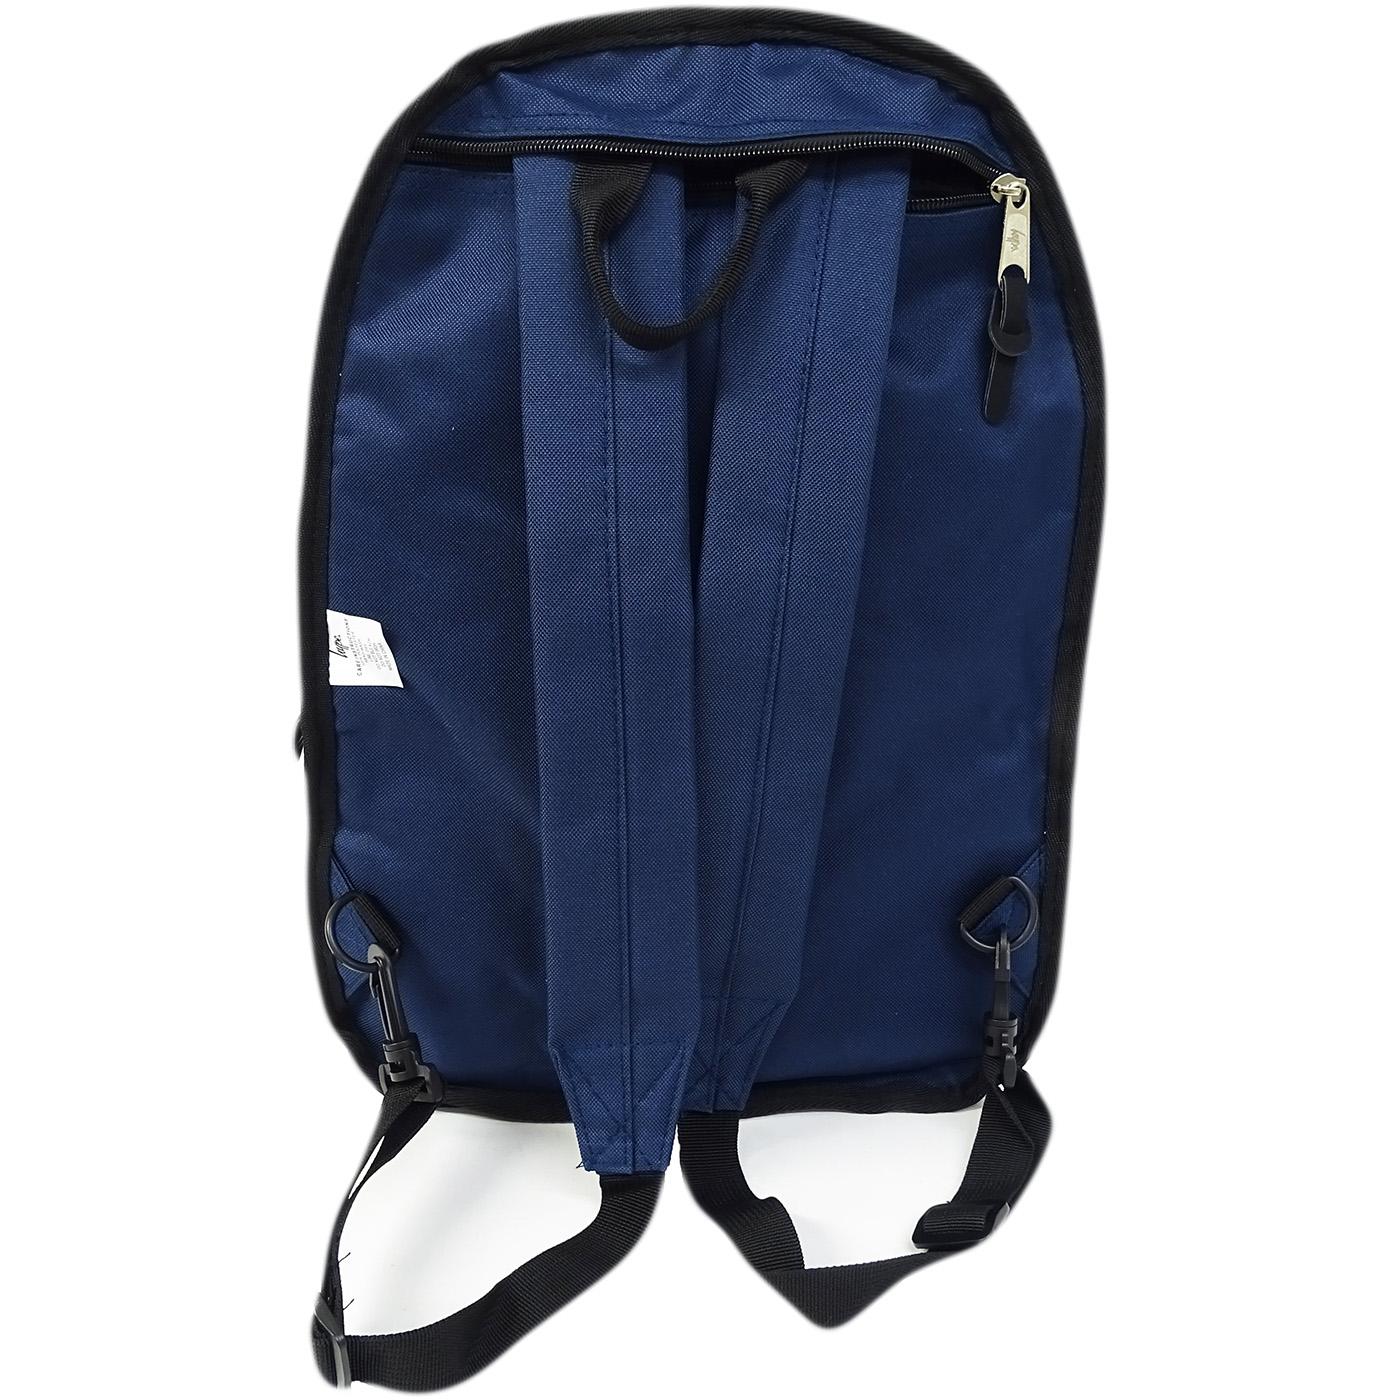 Unisexe-Hype-Sac-A-Dos-Ecole-Gym-SACS-pochettes-pencil-case miniature 175